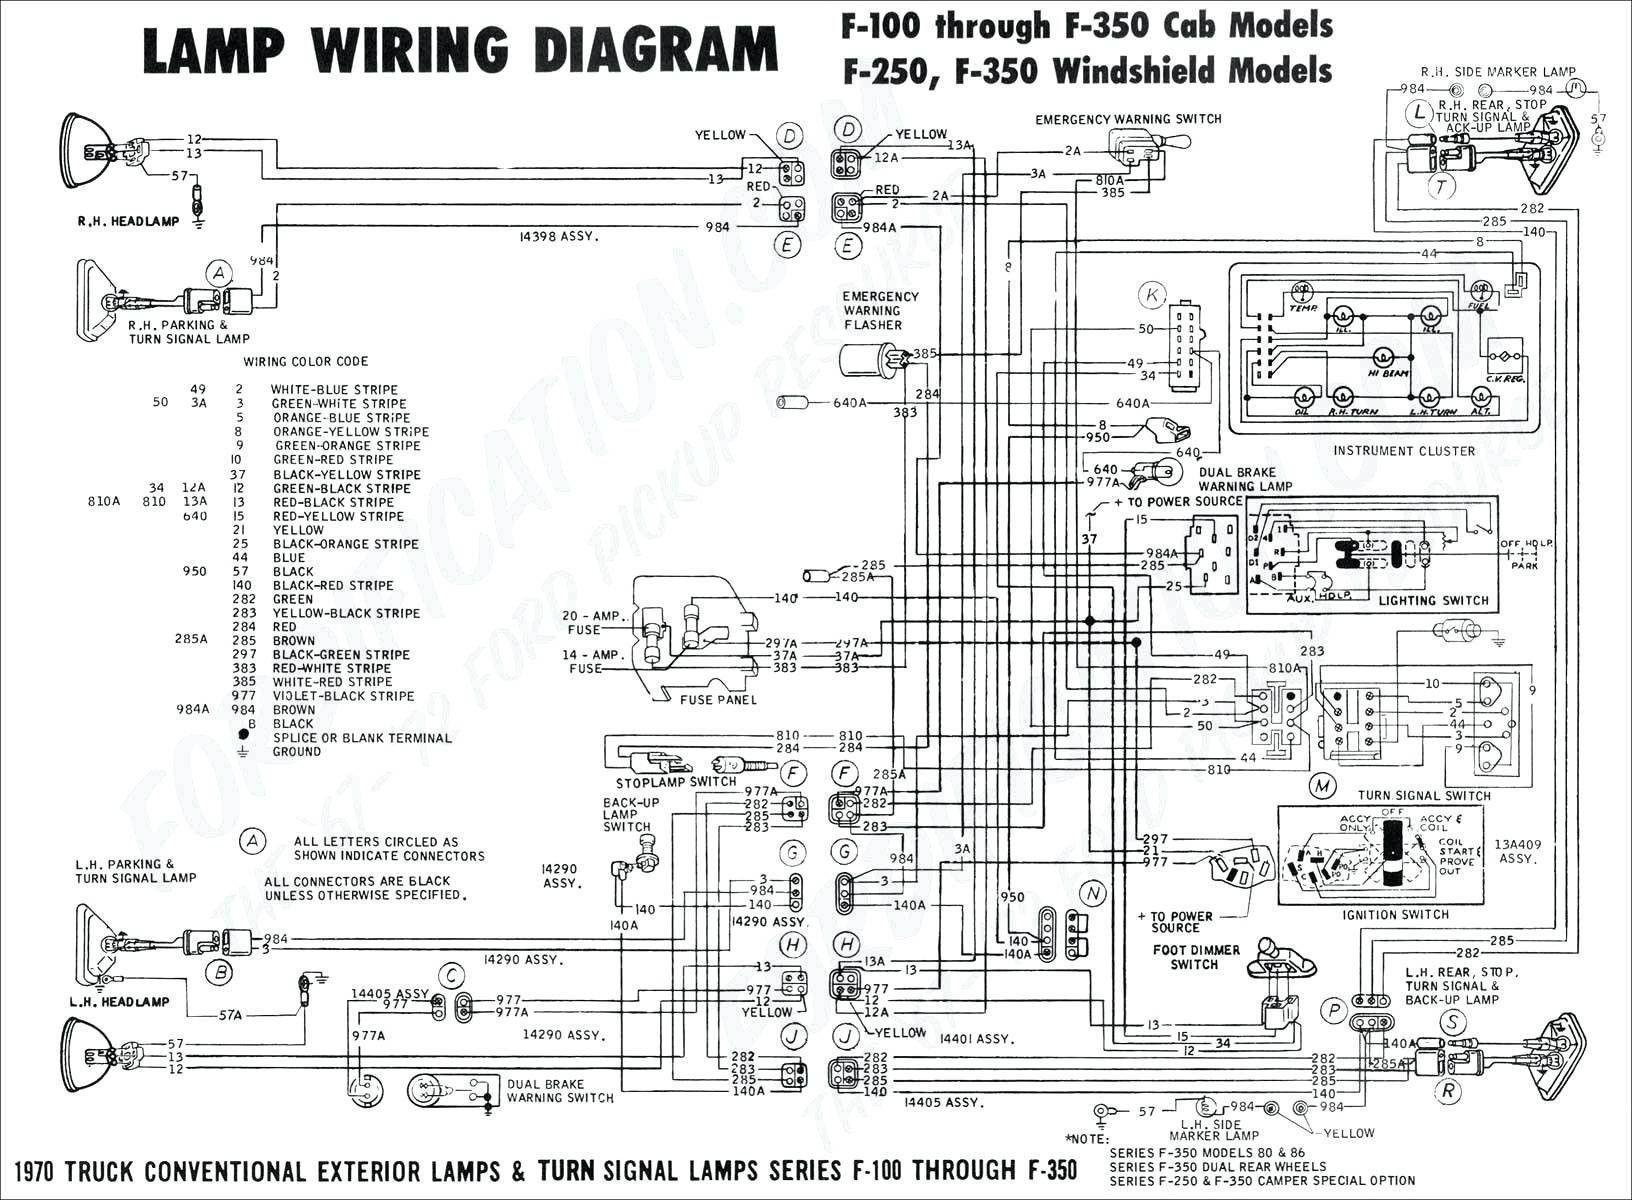 Enginew Iring Diagram 2003 Dodge Ram 5.7 Hemi 2003 Dodge Ram 1500 Tail Light Wiring Diagram Best 2006 Of Enginew Iring Diagram 2003 Dodge Ram 5.7 Hemi